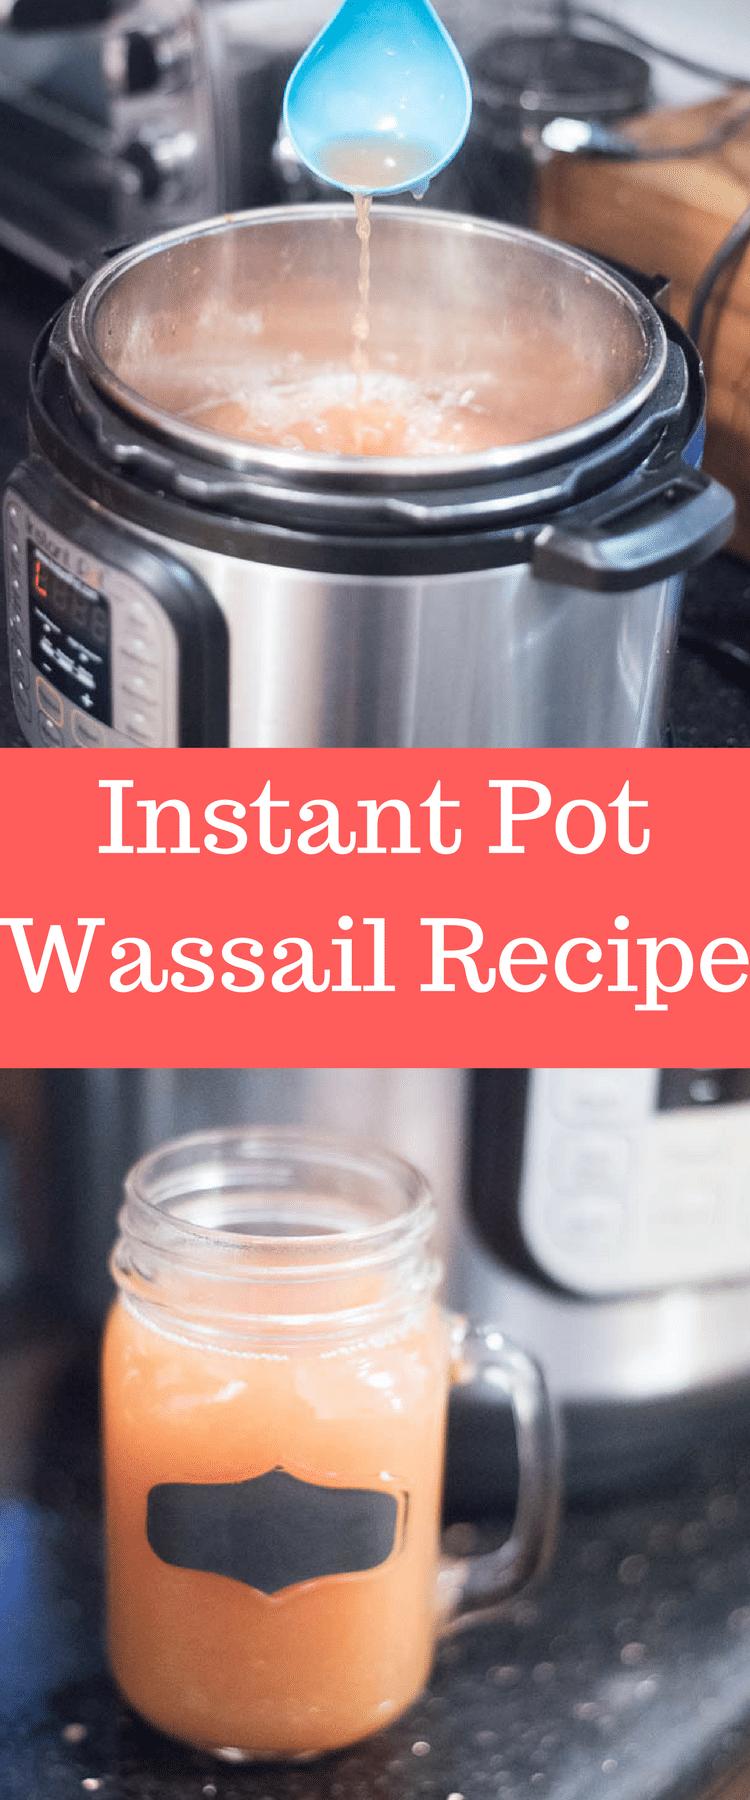 Instant Pot Recipe / Instant Pot Drink Recipe / INstant Pot Wassail / Instant Pot Apple Cider / Non-Alcoholic Drinks #instantpot #instantpotrecipes #pressurecooker  via @clarkscondensed